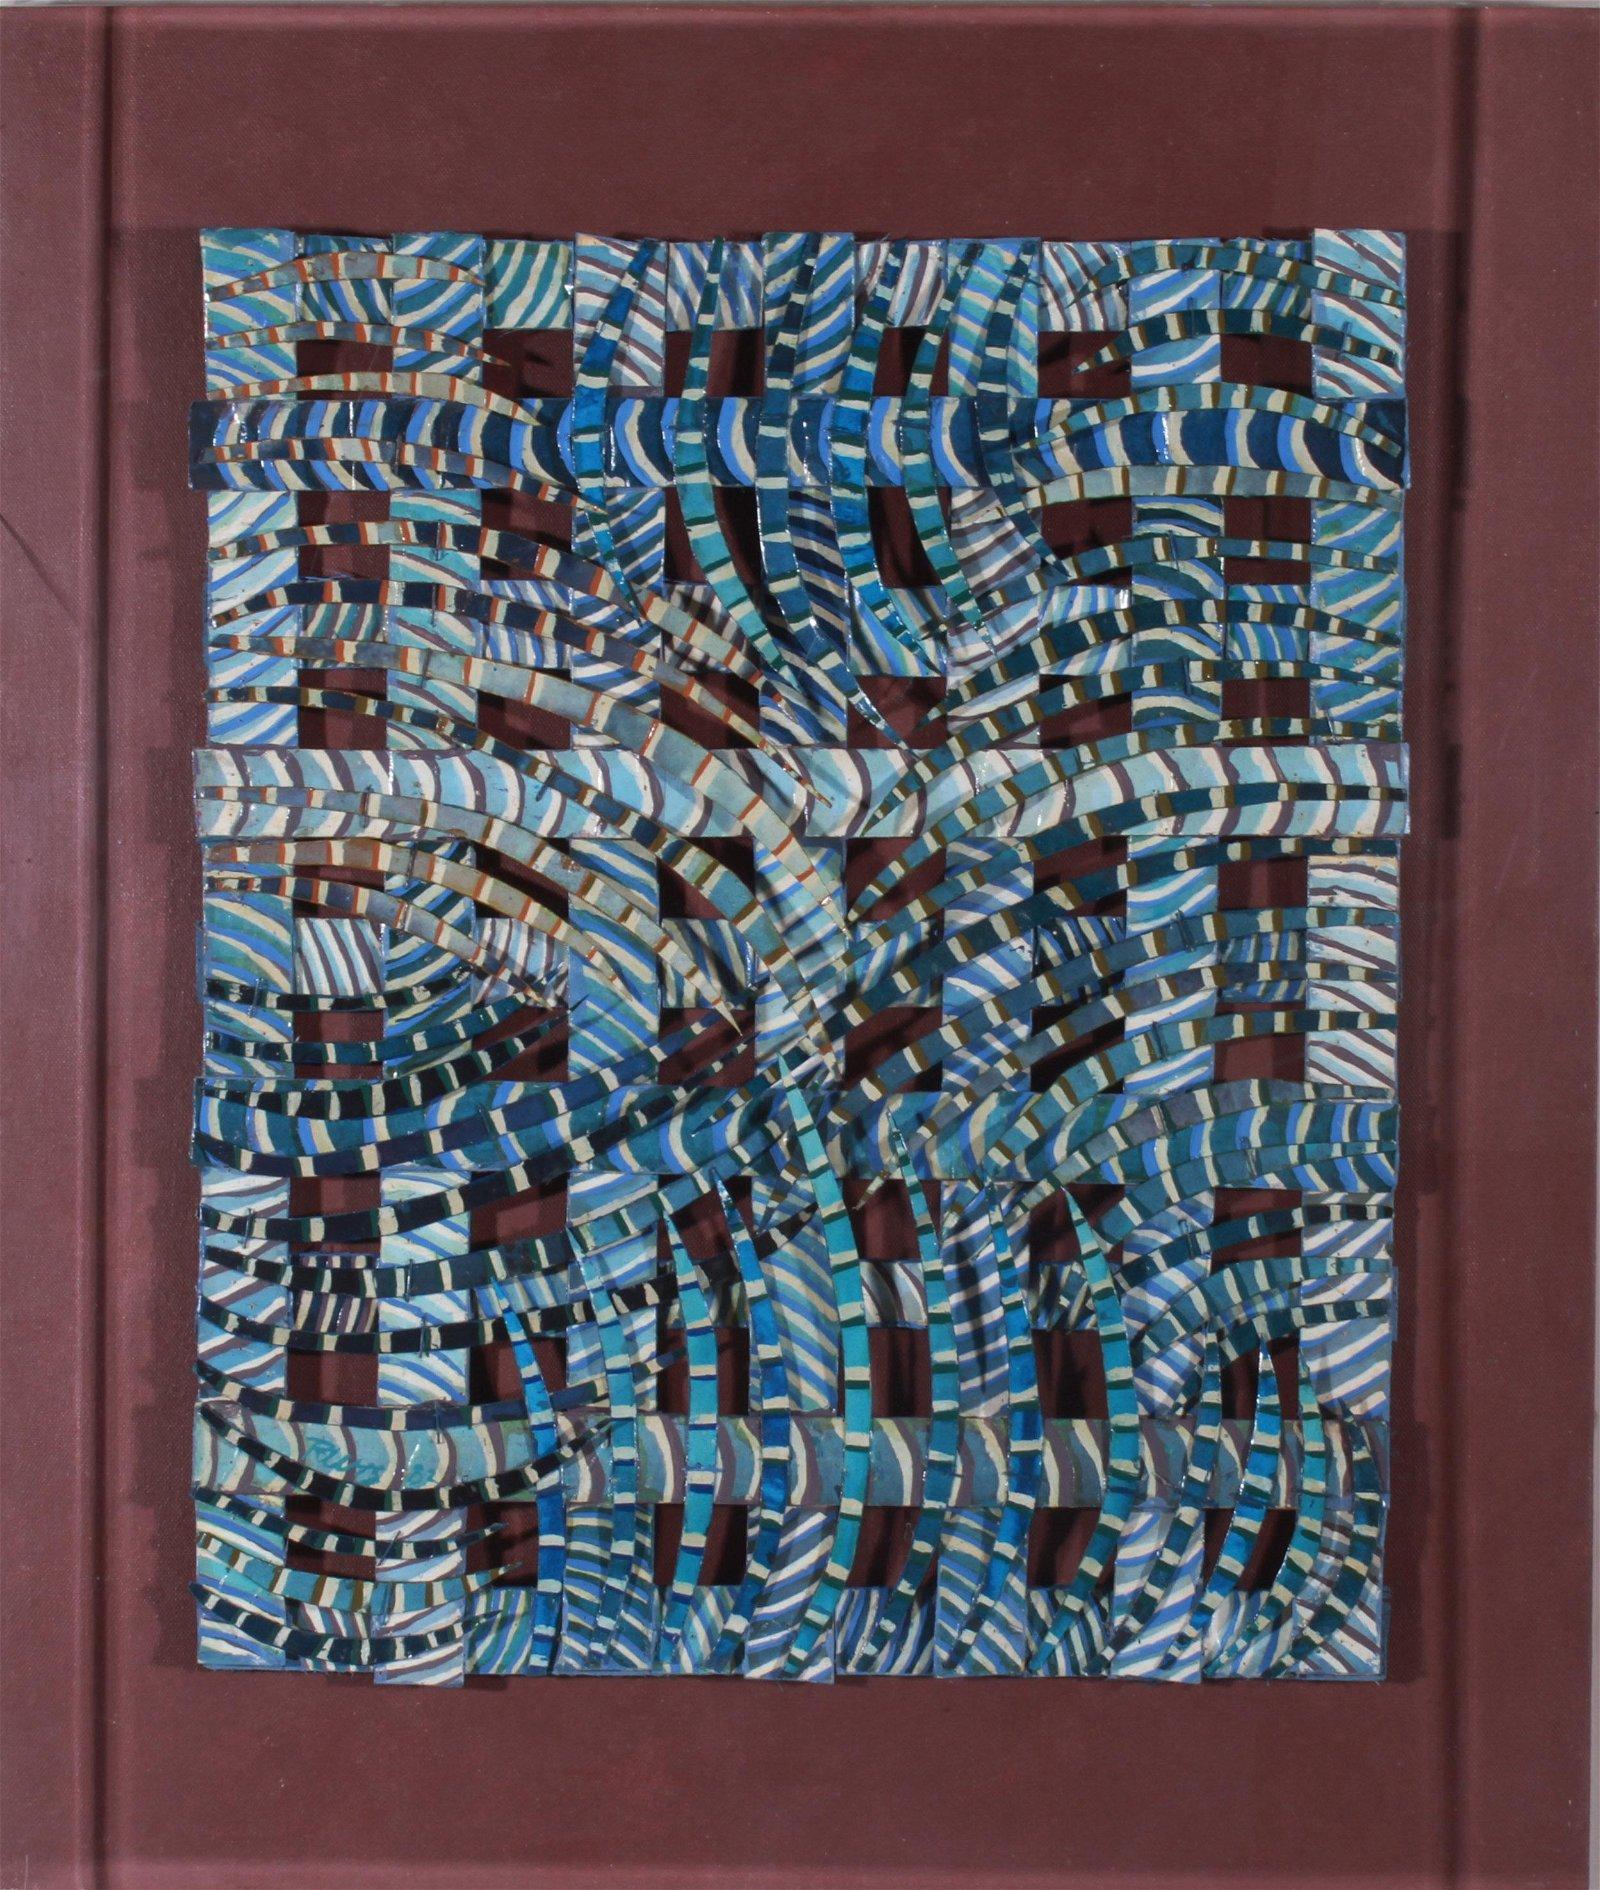 Kris Rutts Abstract Mixed Media Sculpture